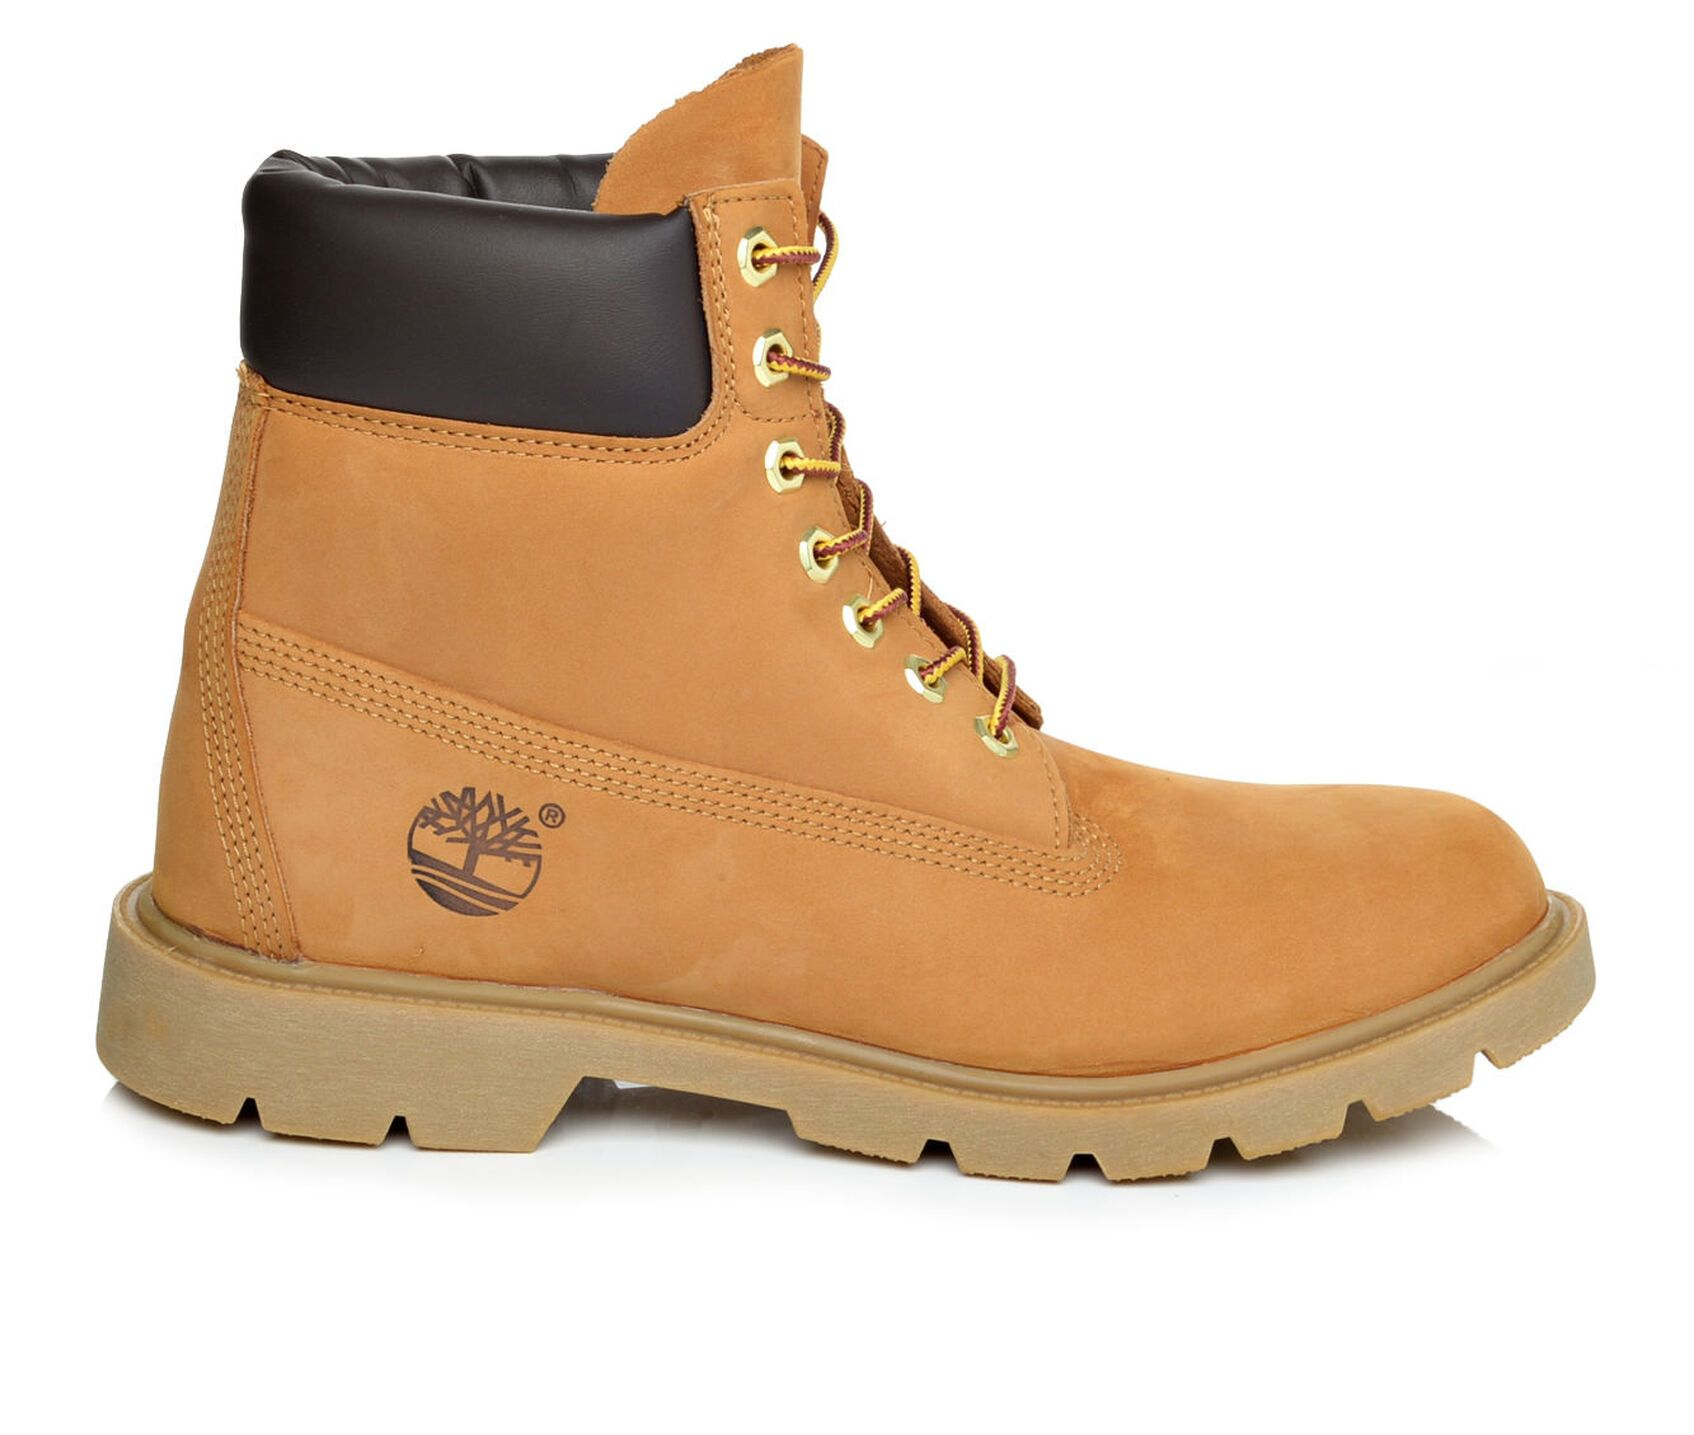 Womens Timberland Boots Shoe Carnival